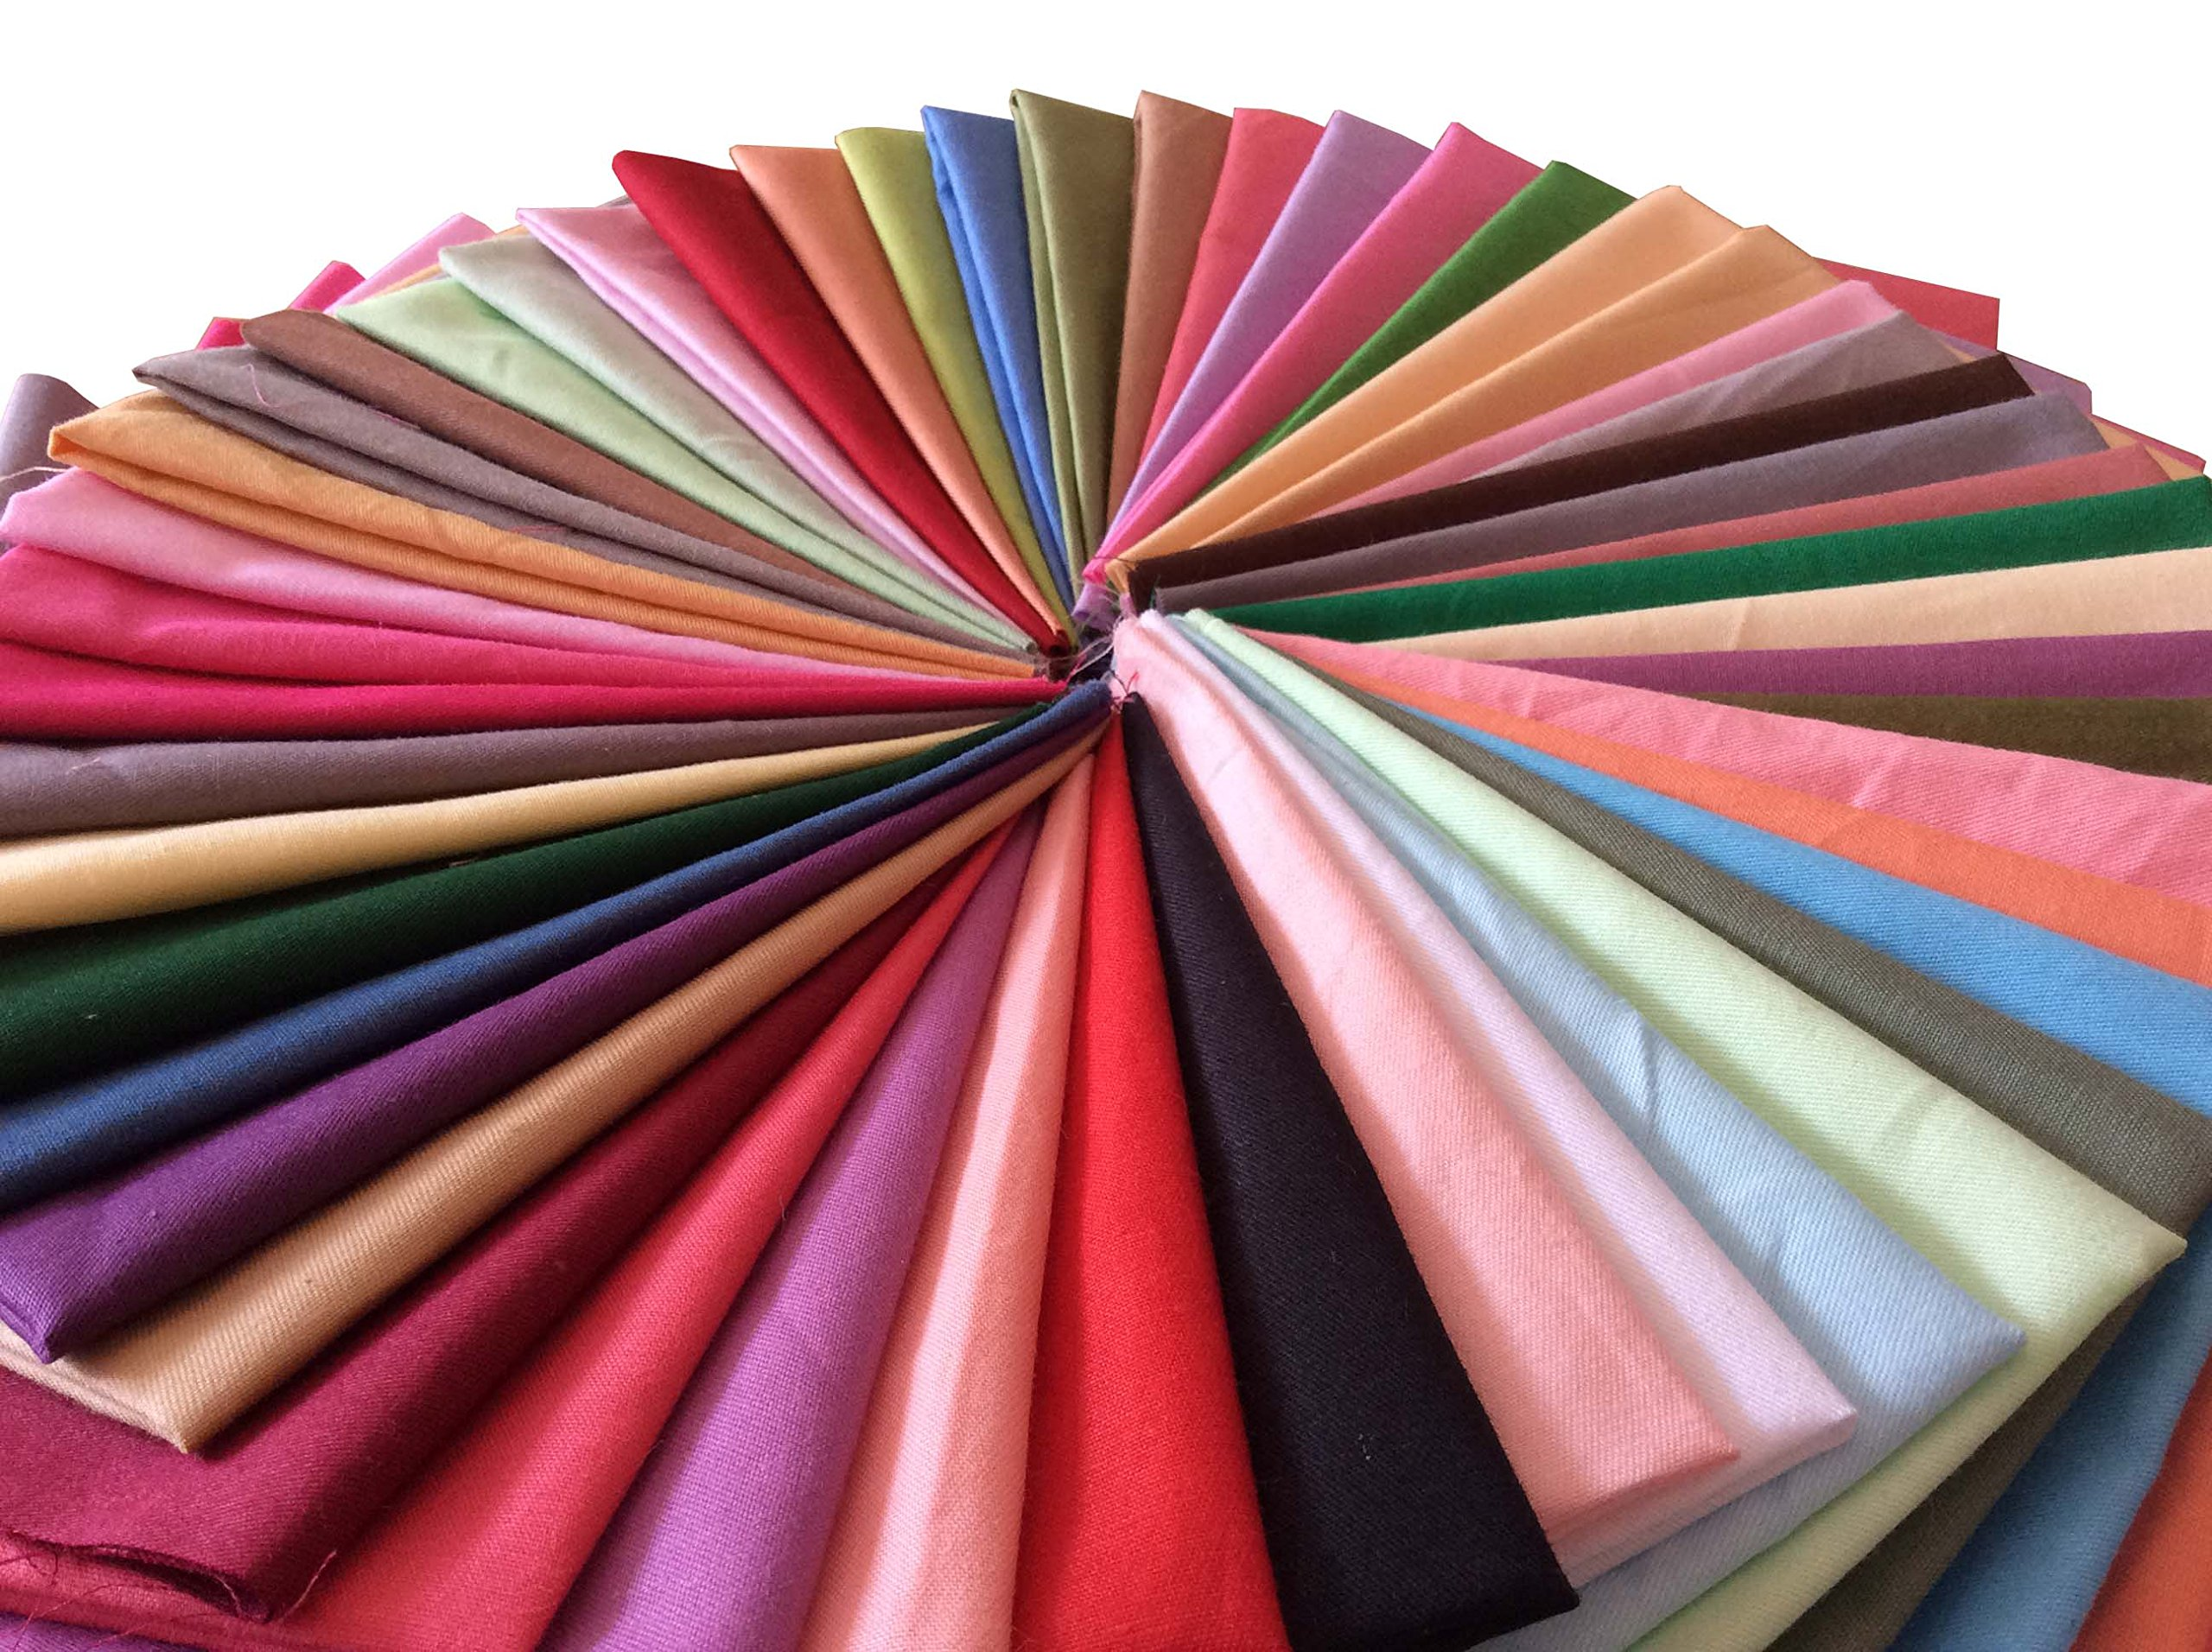 longshine-us 25pcs Solid Colors Premium Cotton Craft Fabric Bundle Squares Patchwork Lint DIY Sewing Scrapbooking Quilting Dot Pattern Artcraft (10'' x 10'') by longshine-us (Image #6)